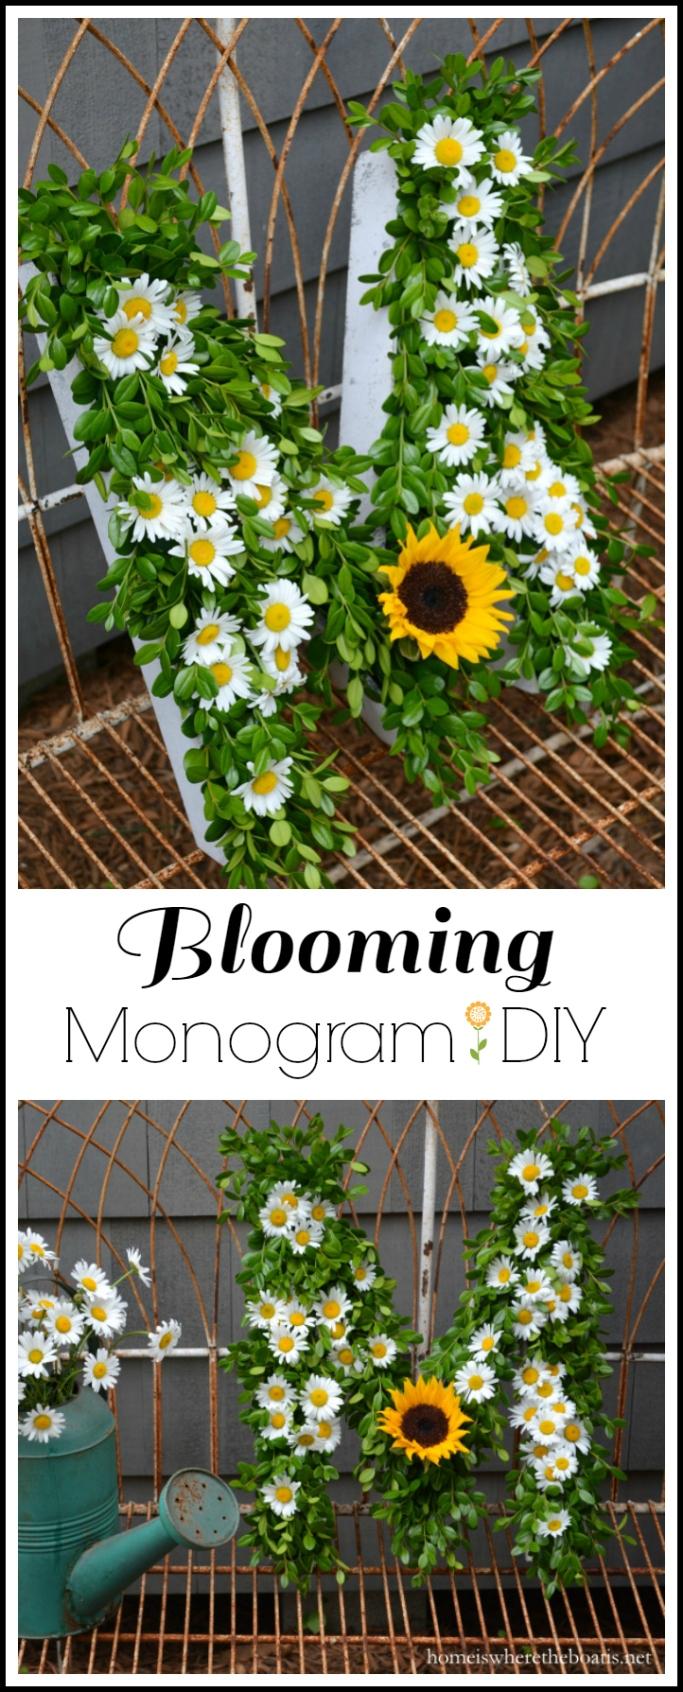 Blooming Monogram DIY